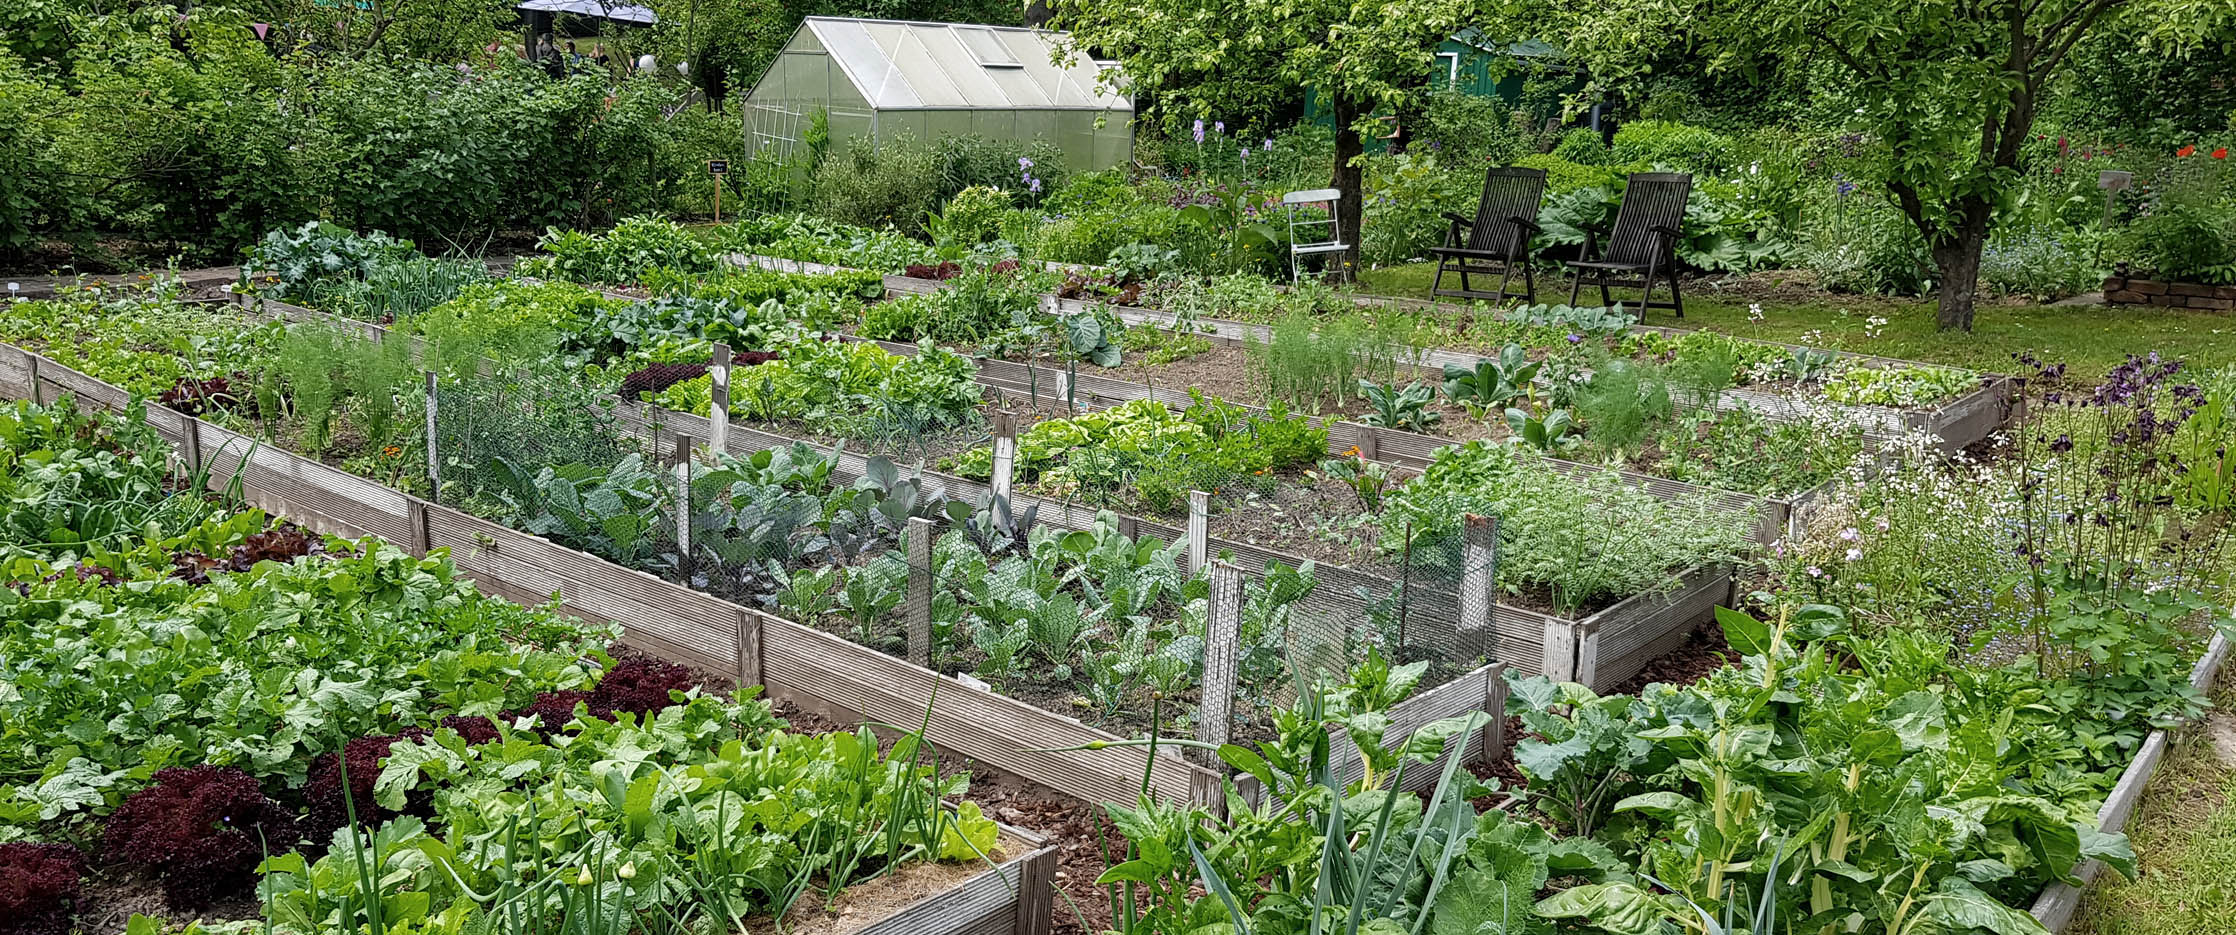 Gartenblog Grüneliebe Instagram